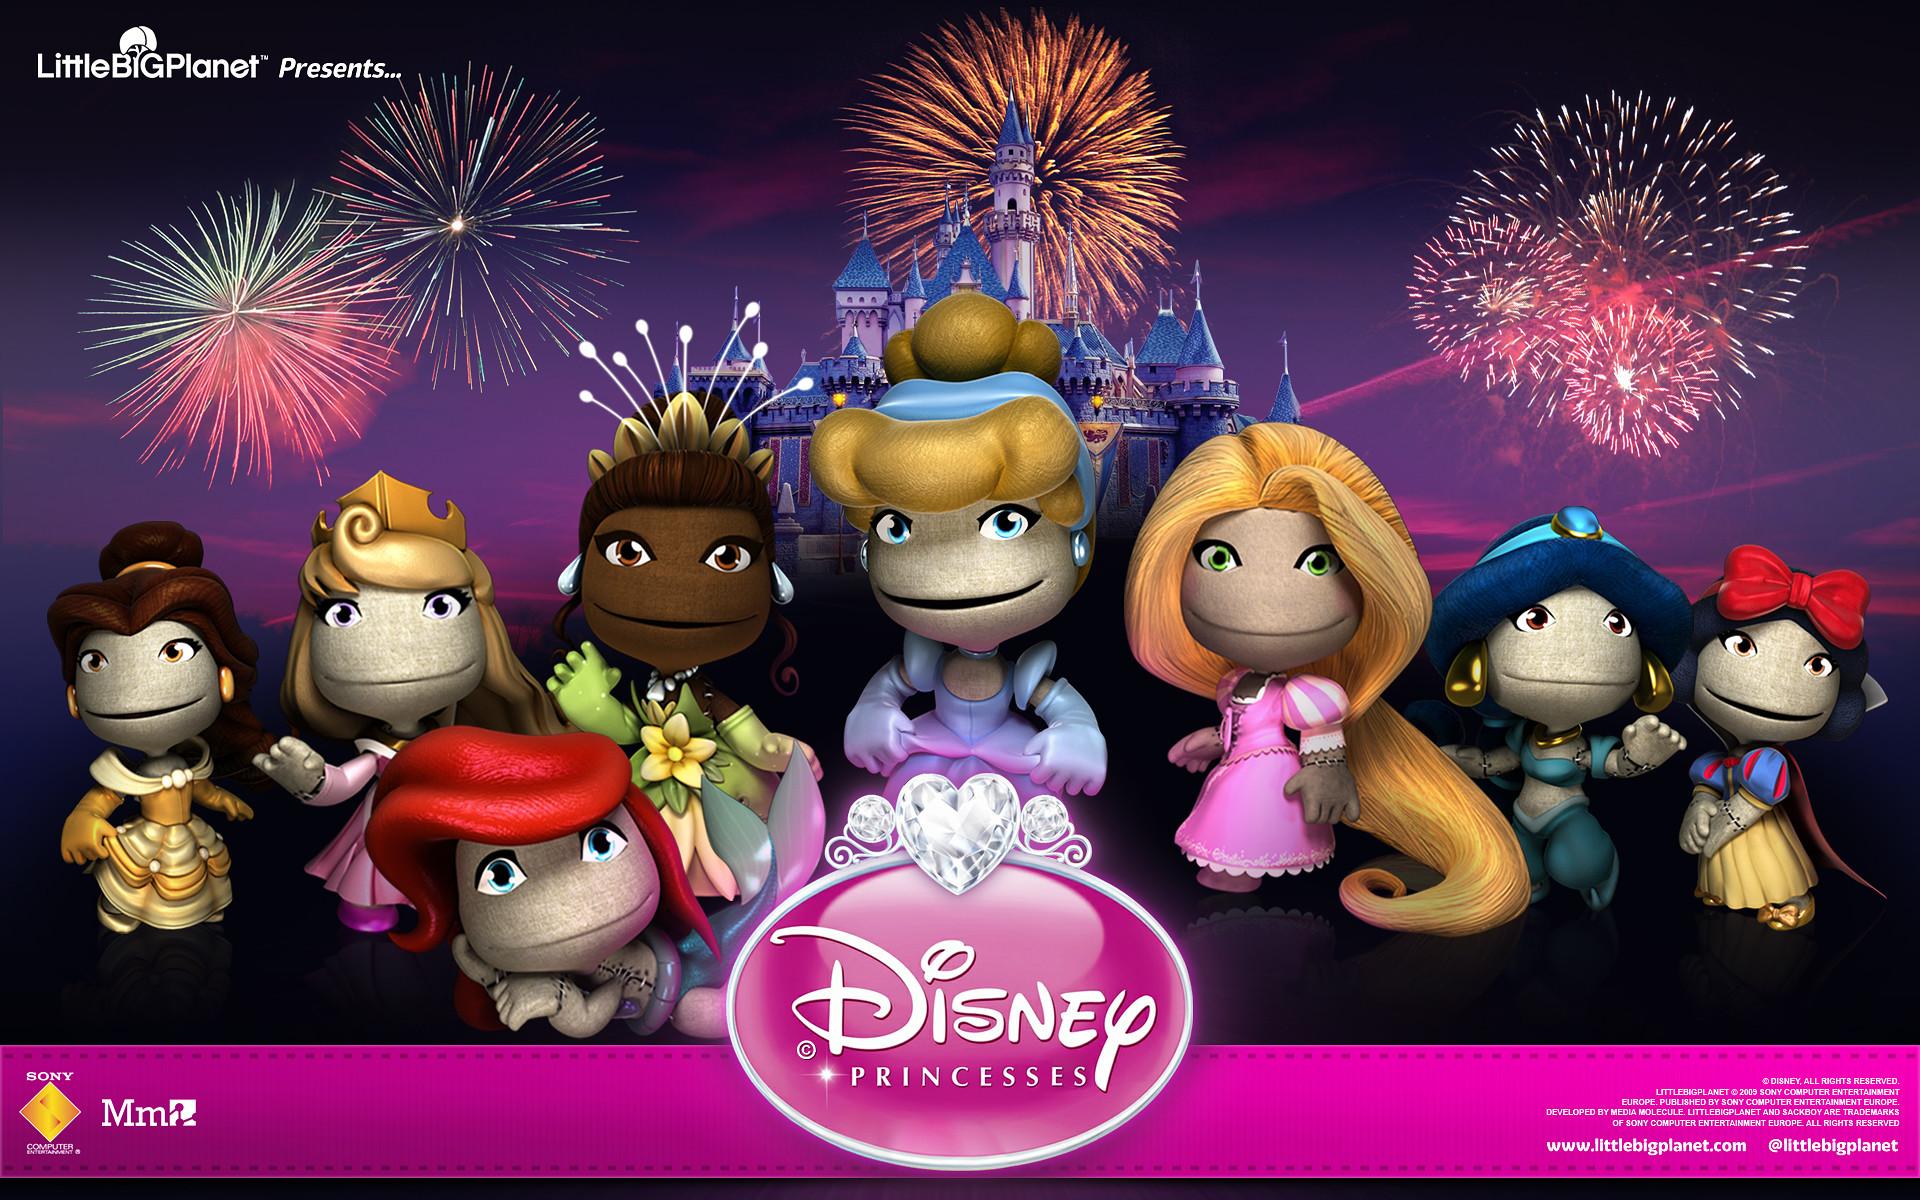 LittleBigPlanet 2's Disney Princess Costume Pack